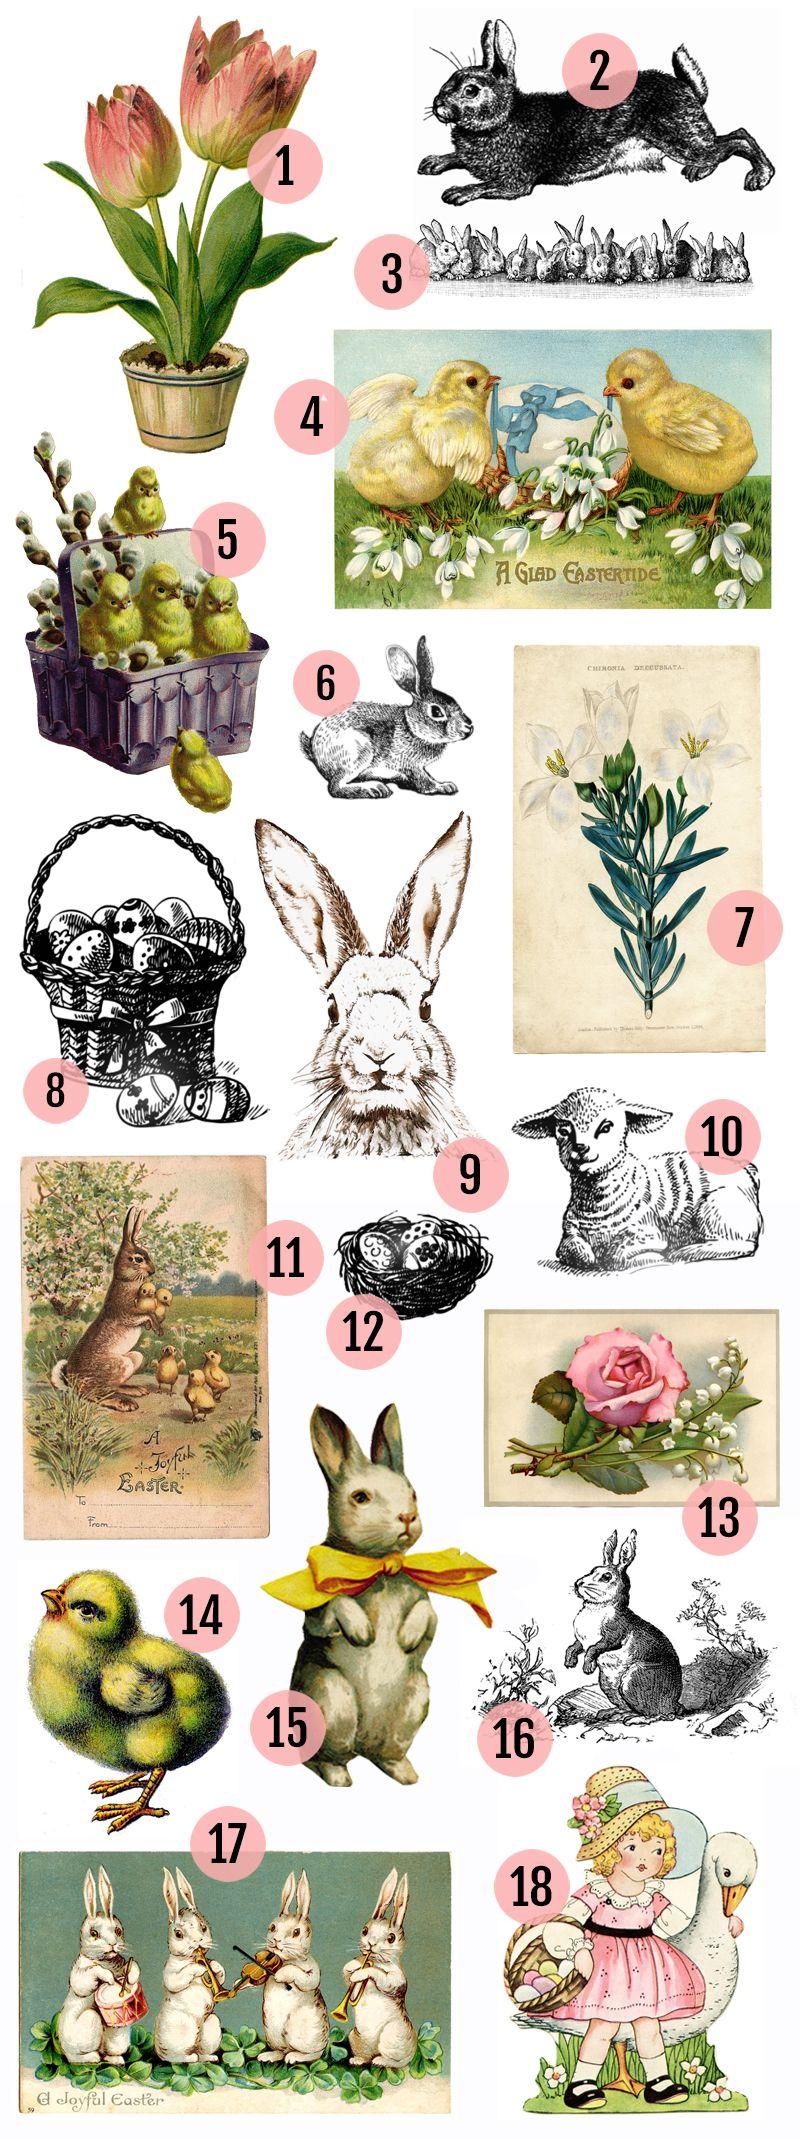 Free Vintage Easter Clipart | Vintage easter, Easter ... Easter Clip Art Free Retro